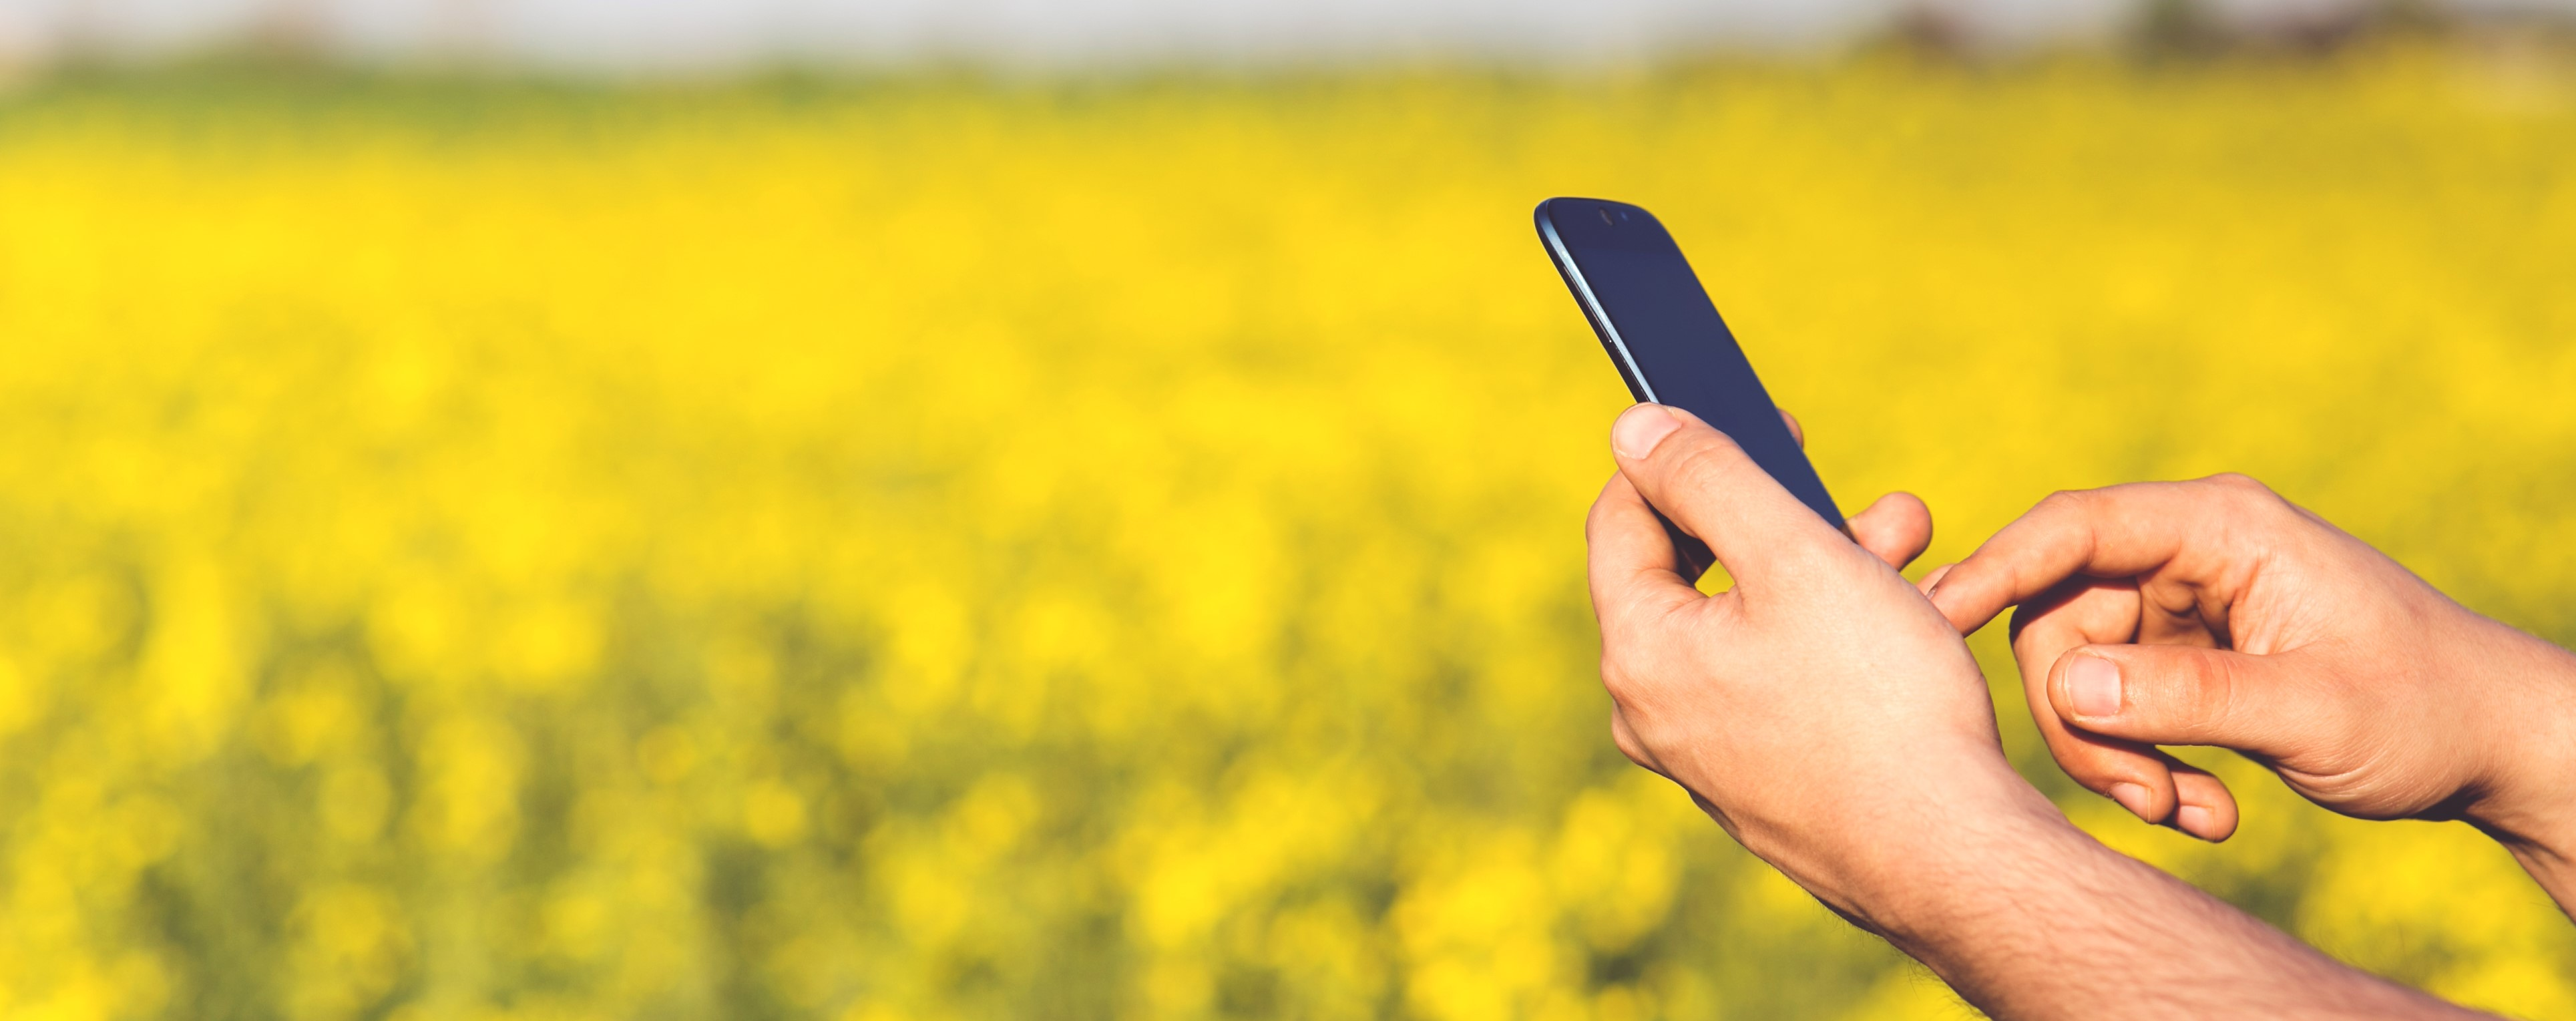 man-field-smartphone-yellow.jpg